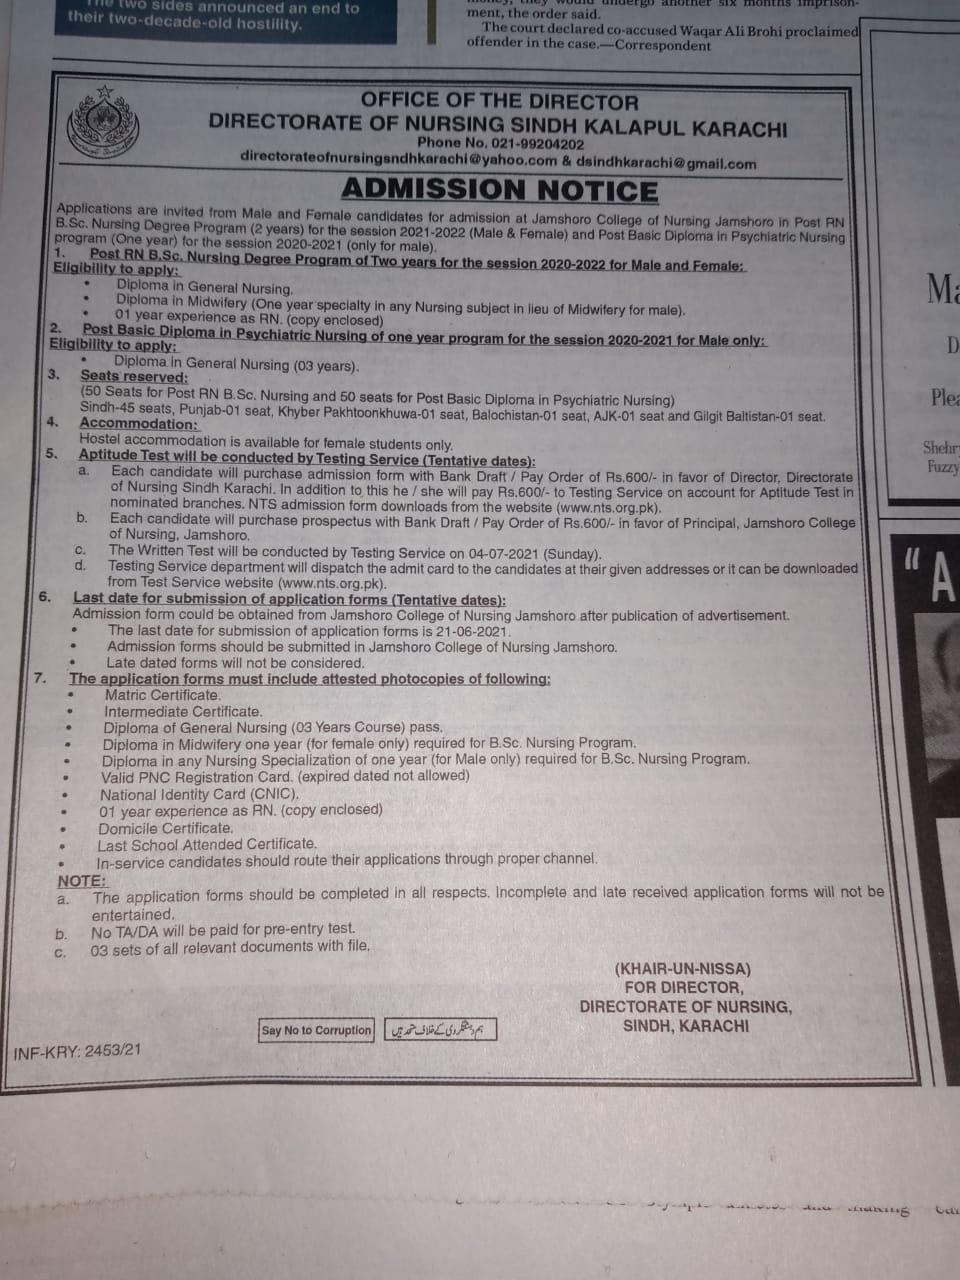 Directorate of Nursing Sindh Admission RN BS Nursing Program NTS Slip